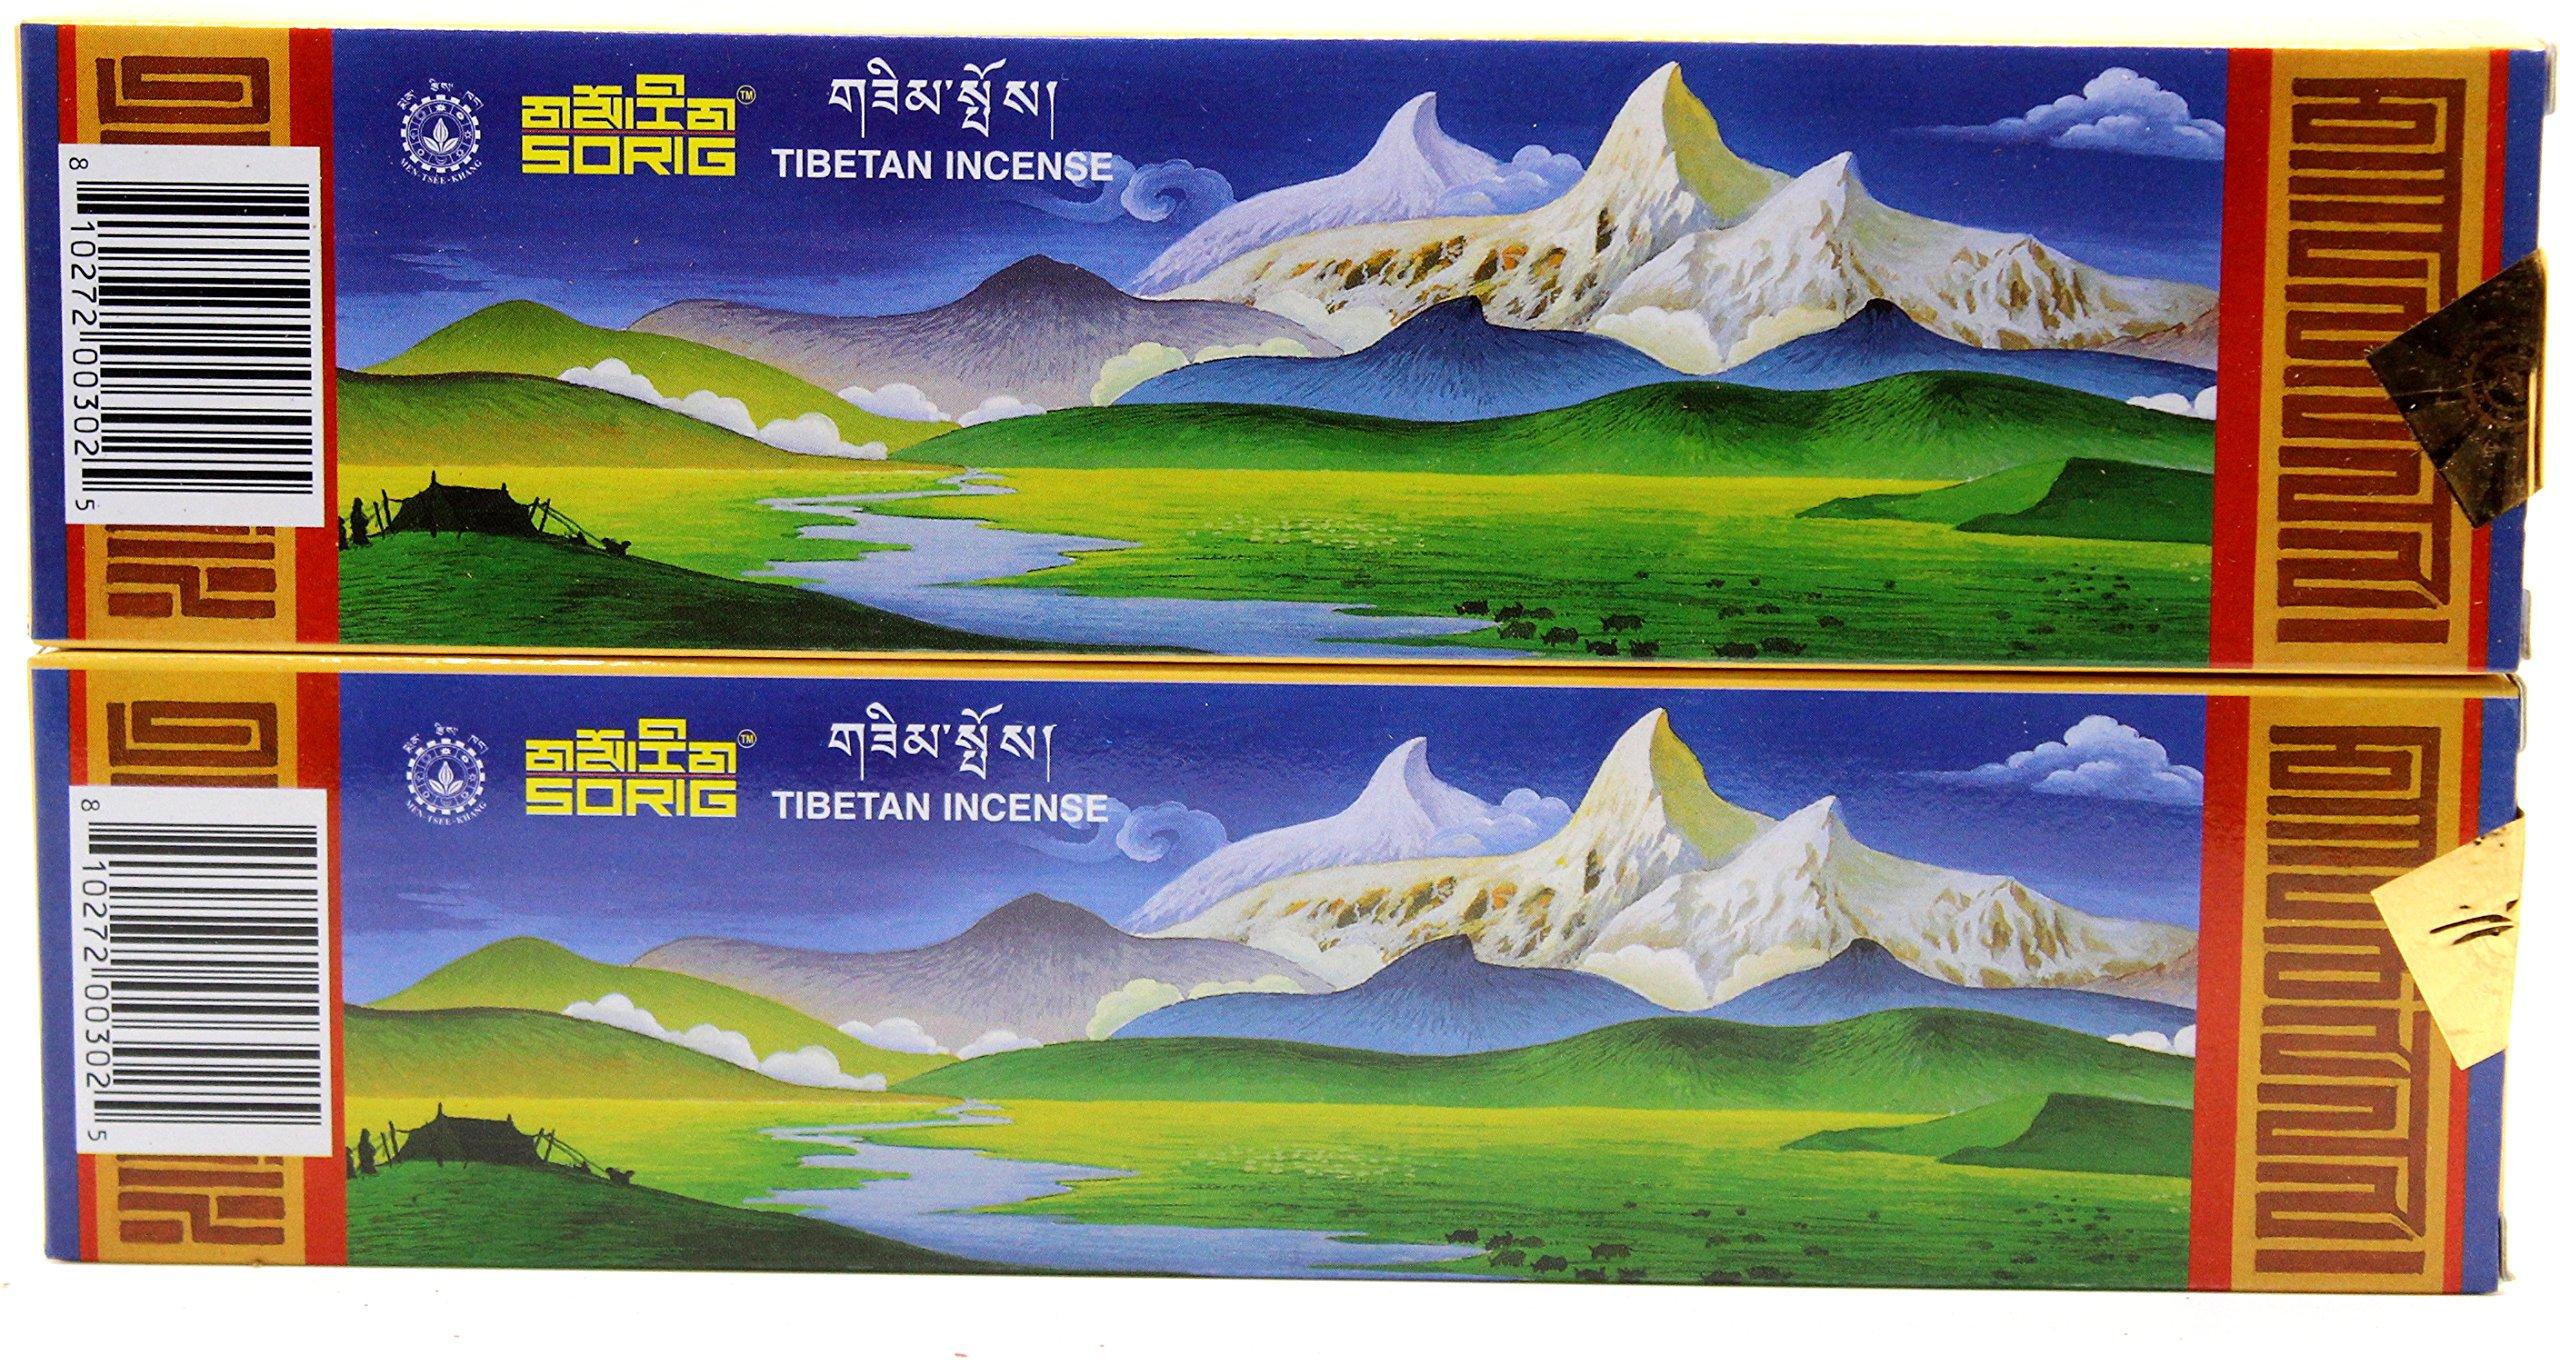 Handmade Tibetan Incense 80 Sticks (2 Boxes of 40 Sticks Each) By Men-Tsee-Khang